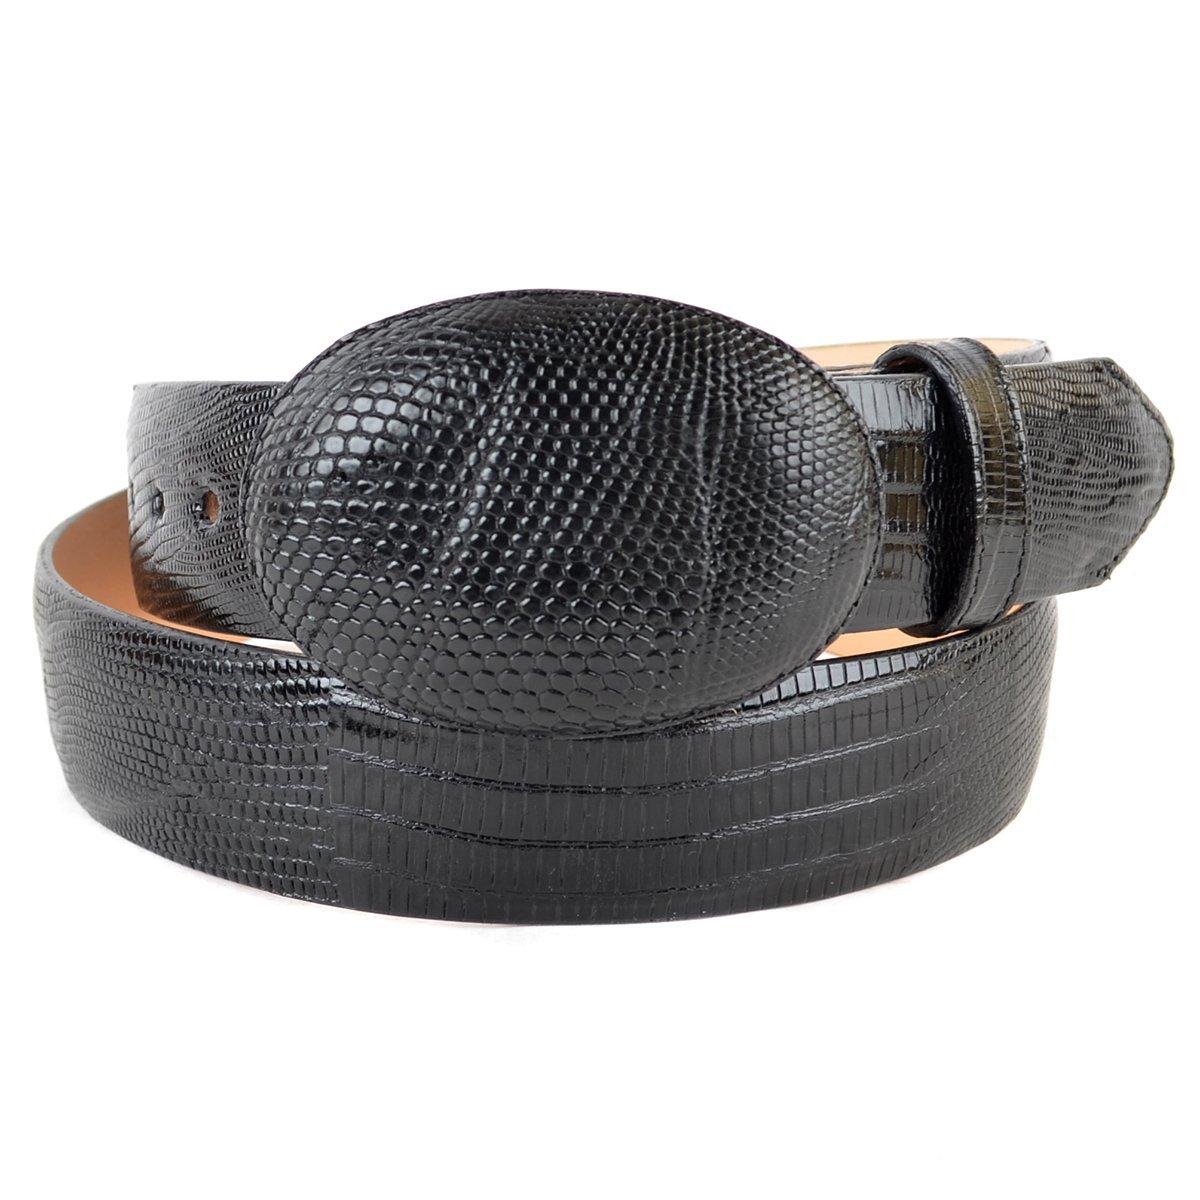 Original Black Lizard Teju Skin Western Style Belt